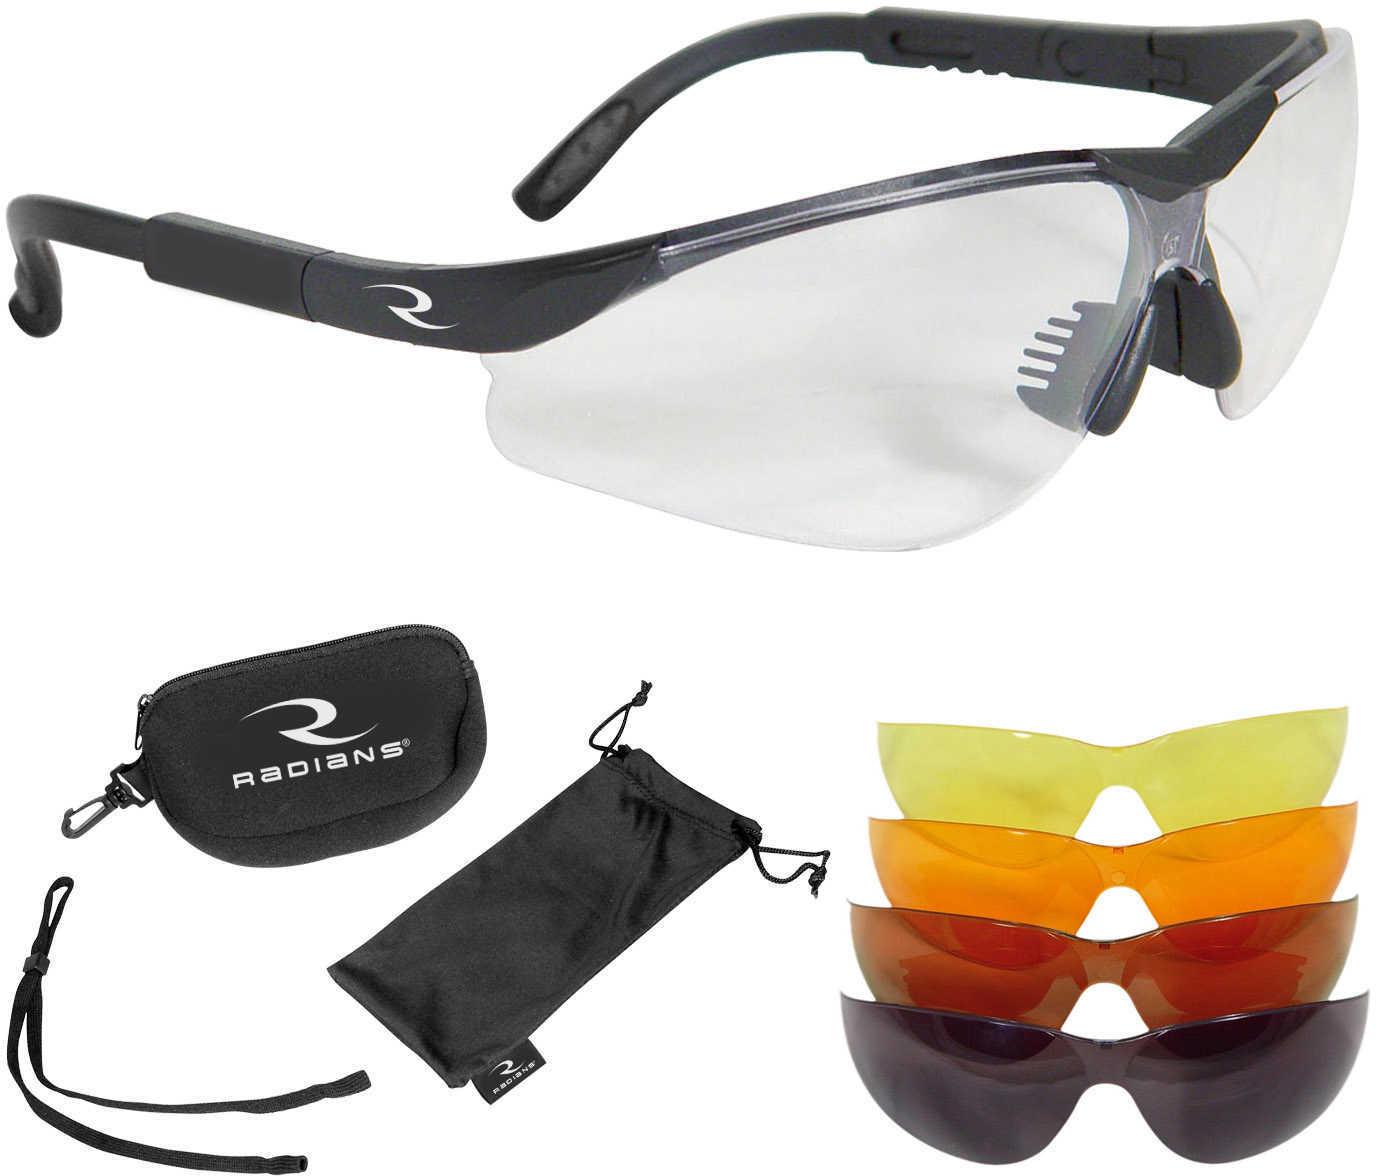 Radians T-85 Glasses Blk Frame Clear Copper Amber Orange Green Mirror Case/Cloth Bag/Neckcord T85RC